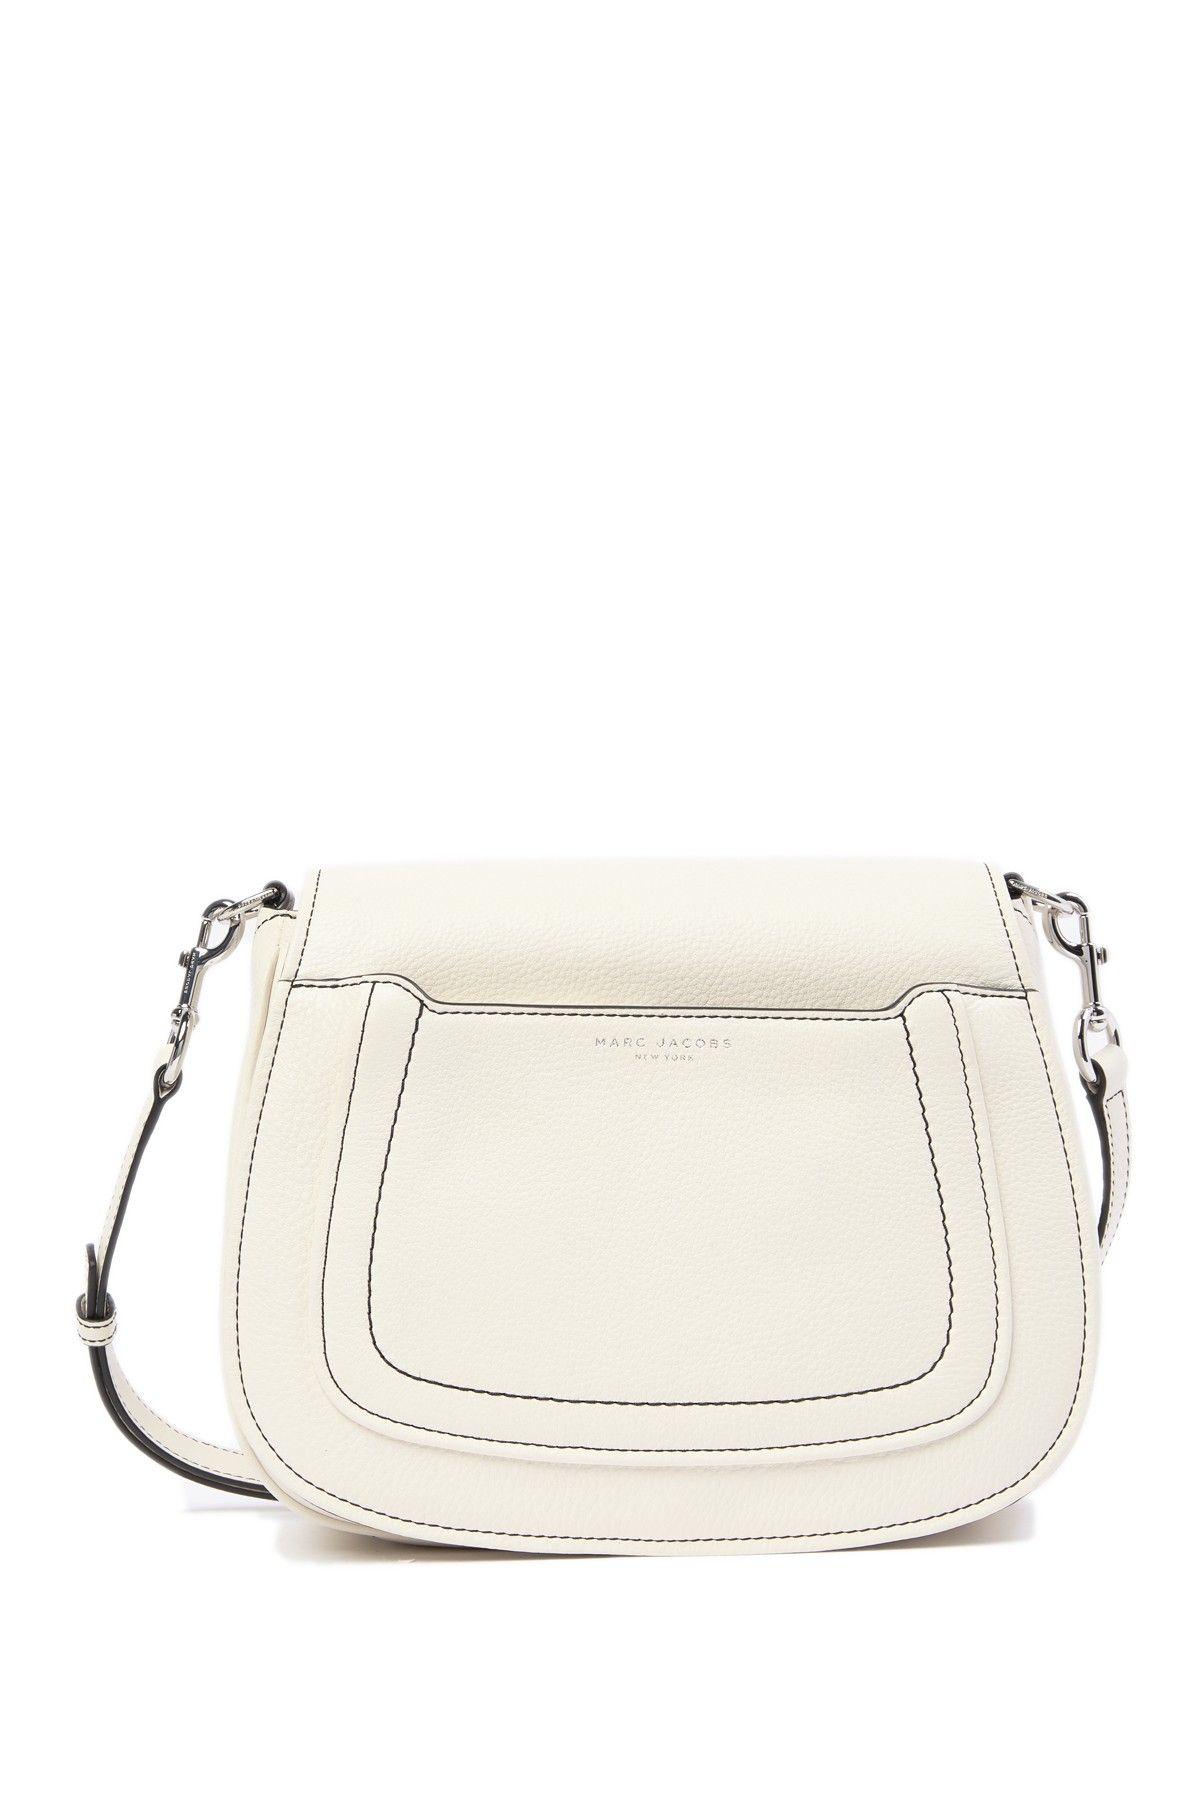 Marc Jacobs | Empire City Messenger Leather Crossbody Bag